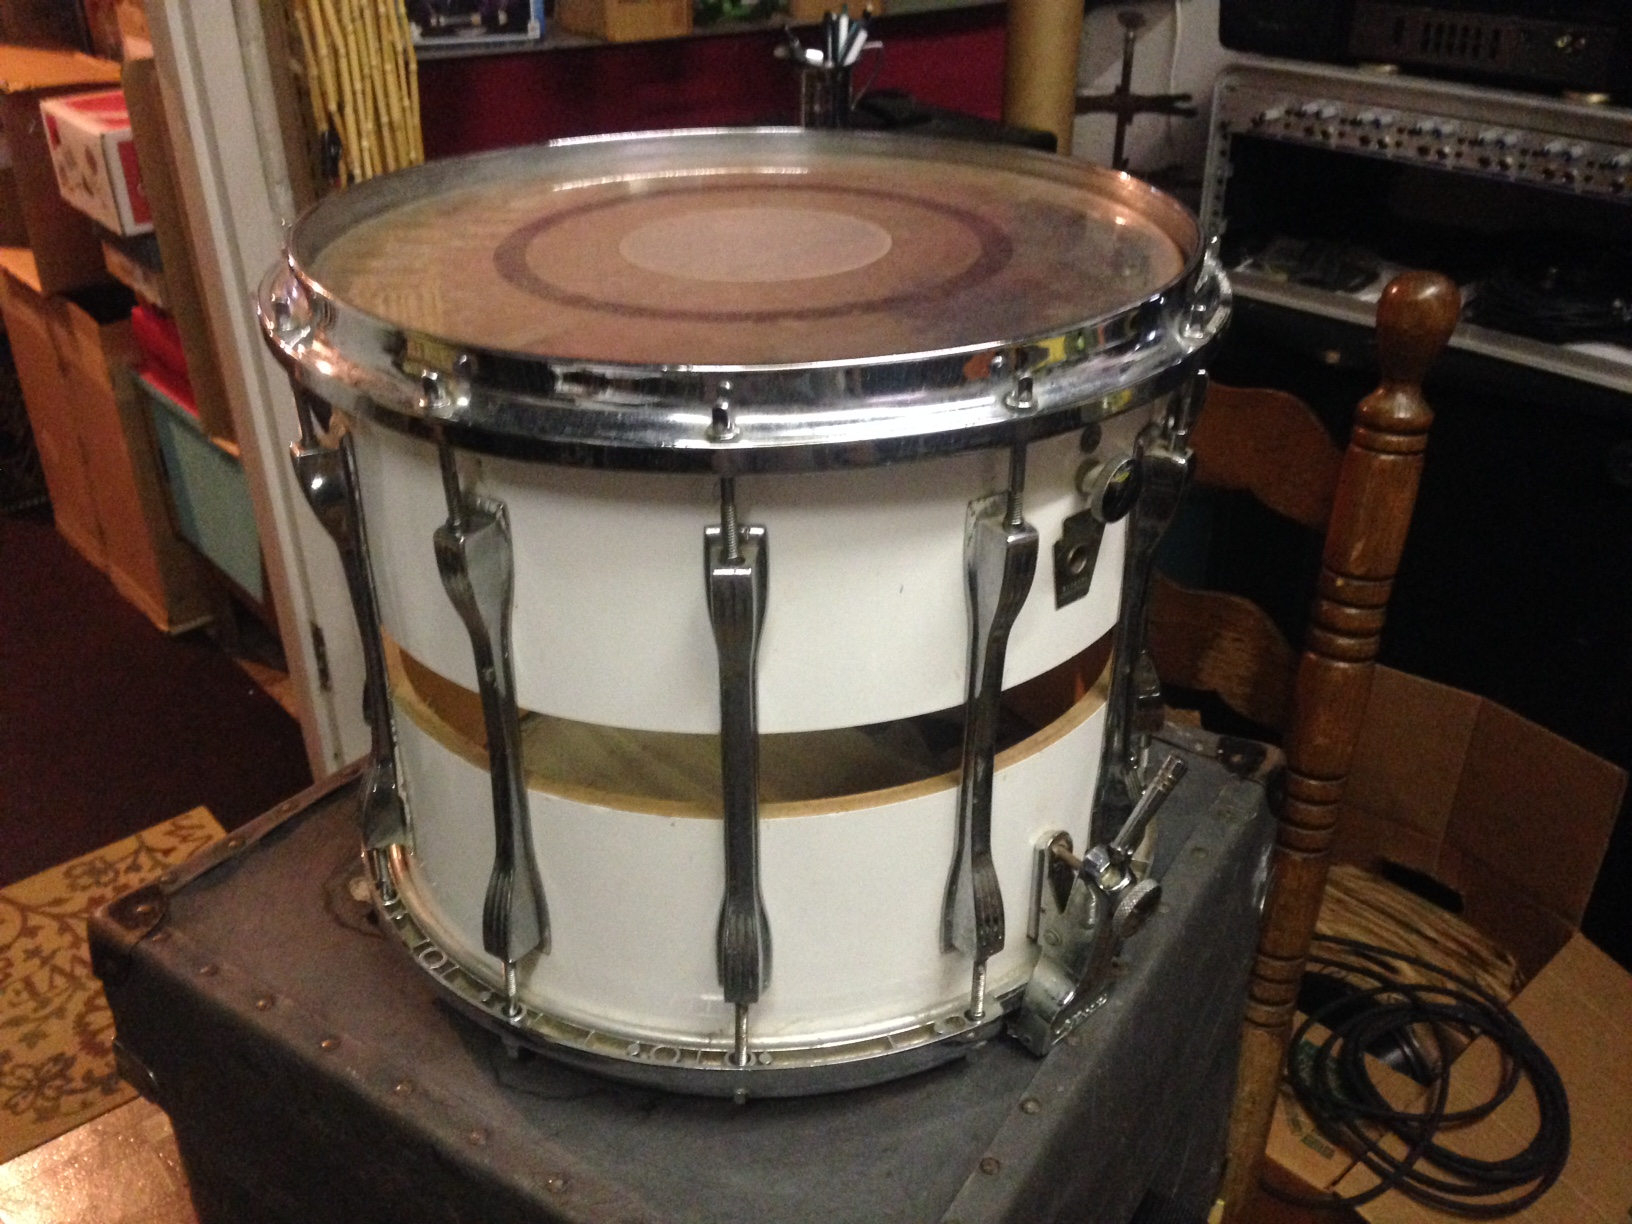 Ocamo DT-33 Drum Kit Drum Stick Bag + Maple Drum Stick + Transparent Mute Sticker